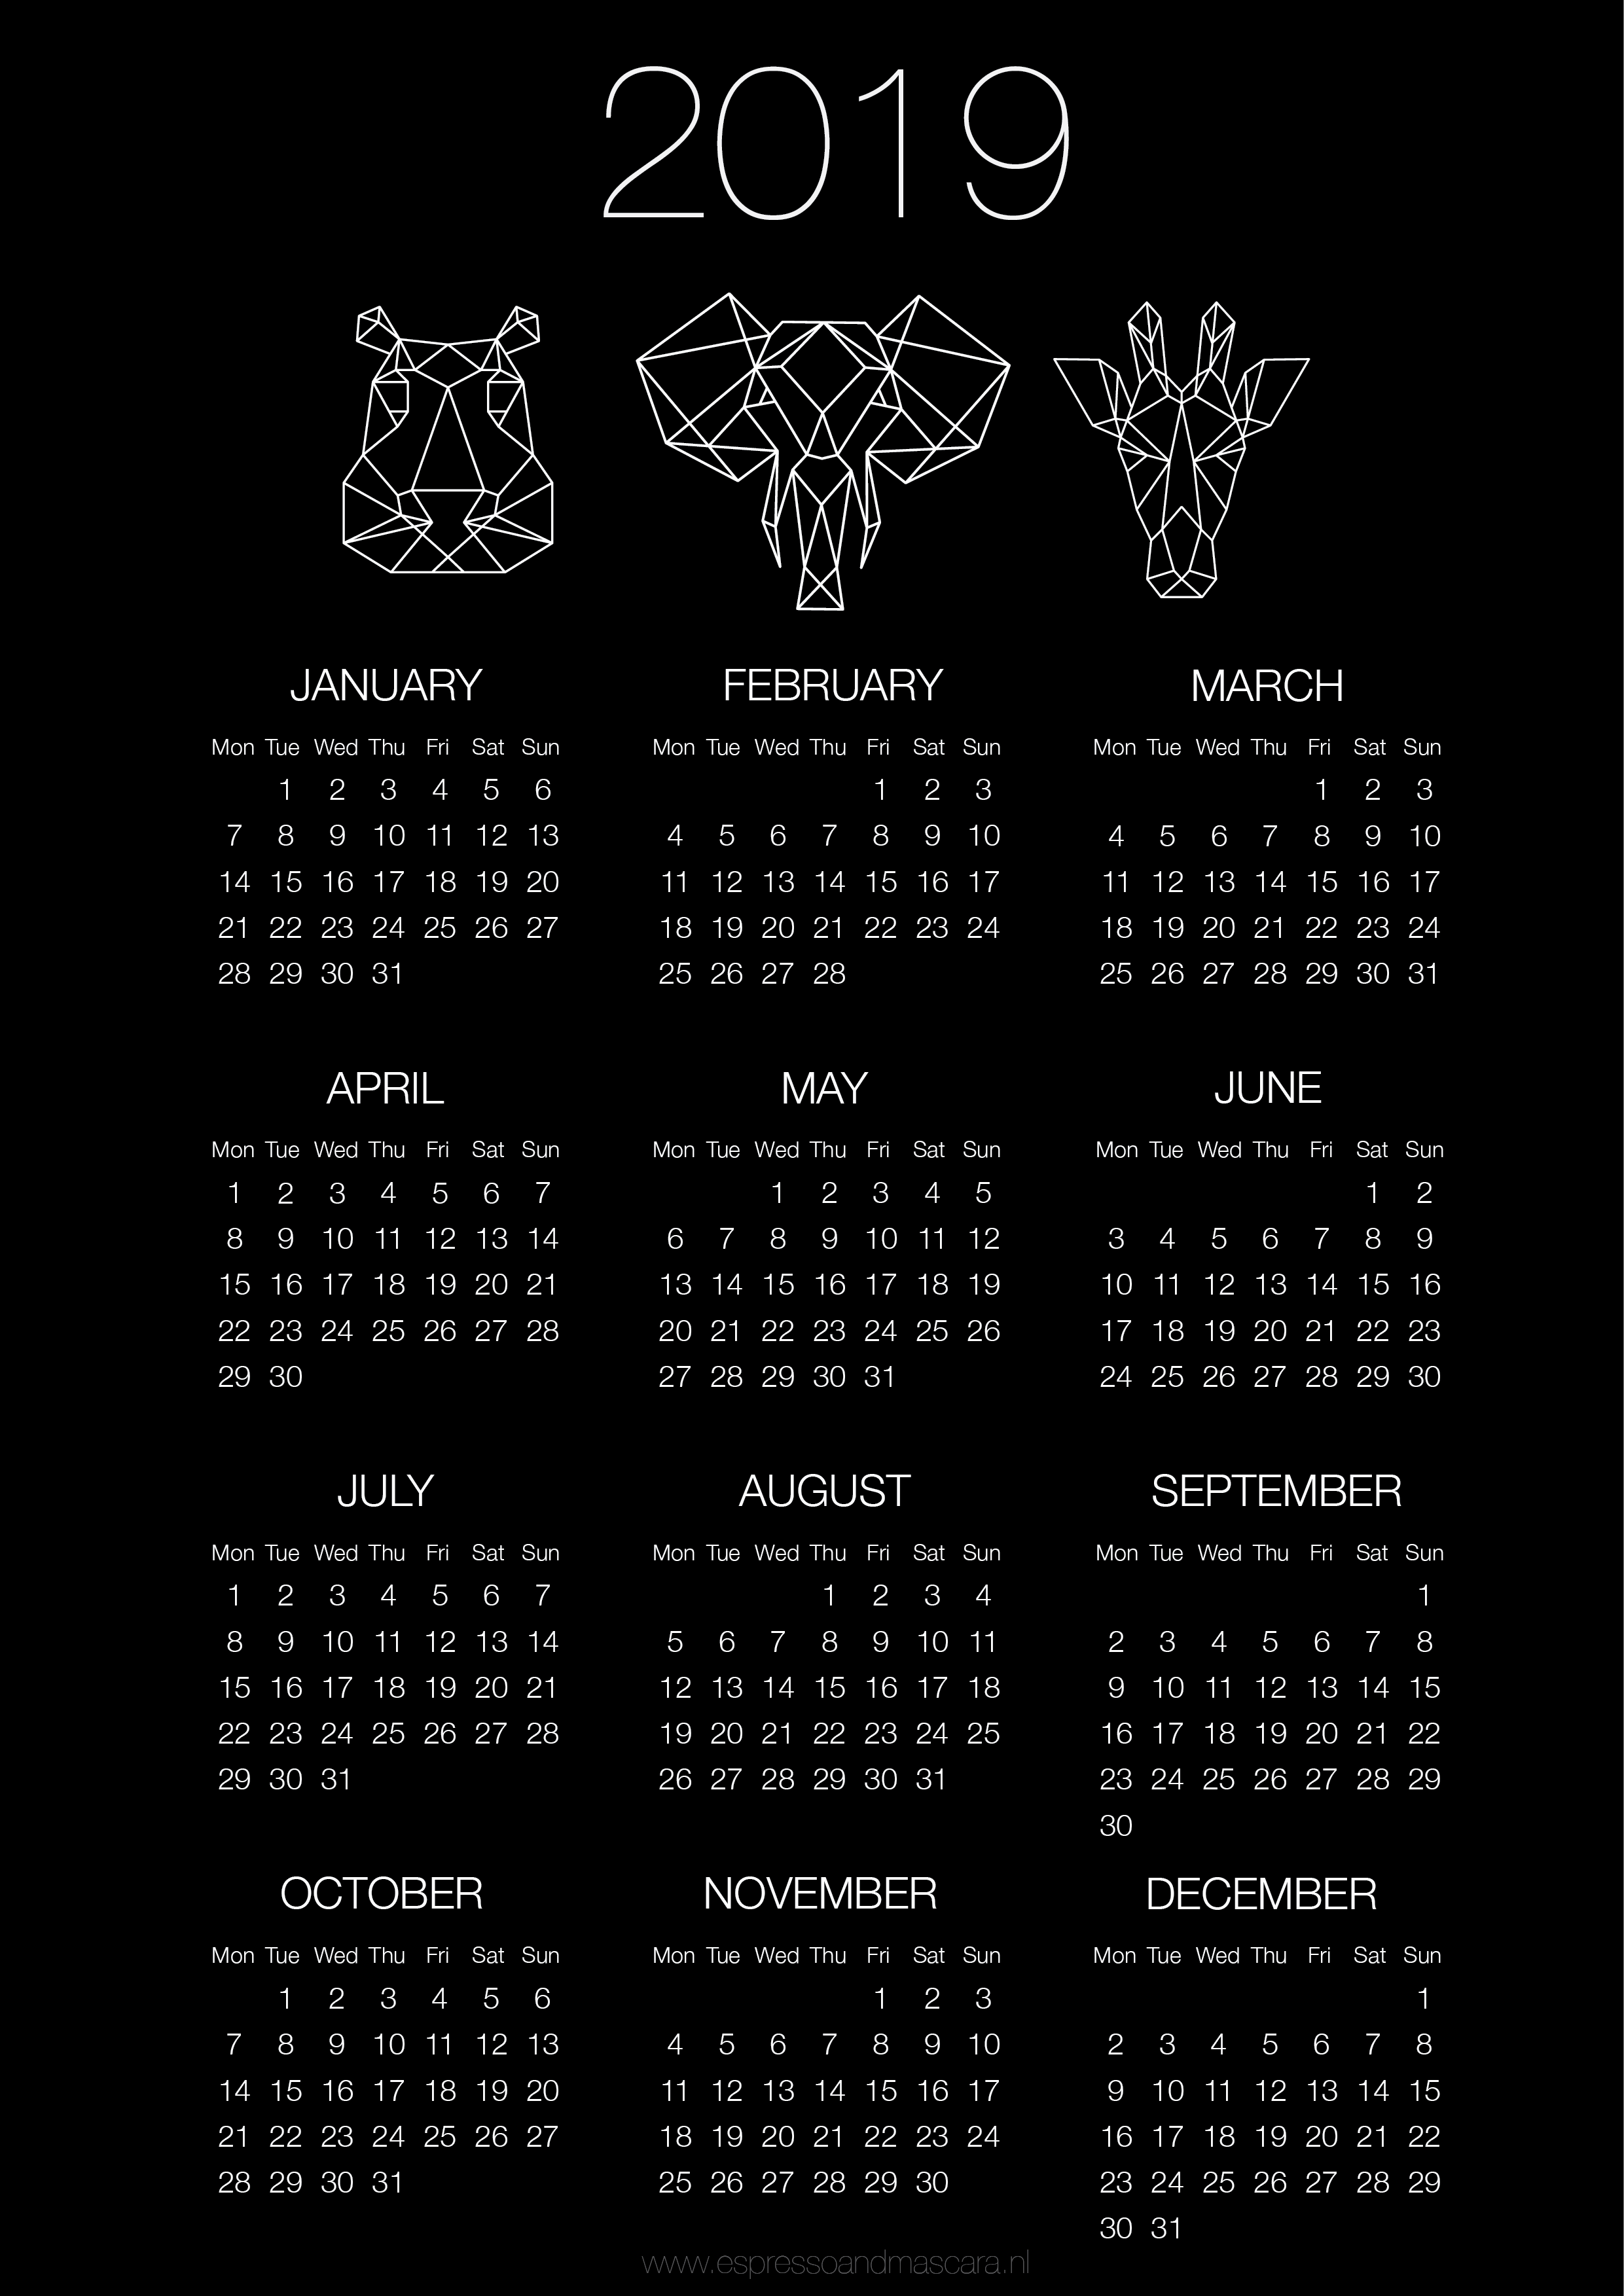 Calendar template 2019 - download free printable - Espresso&Mascara